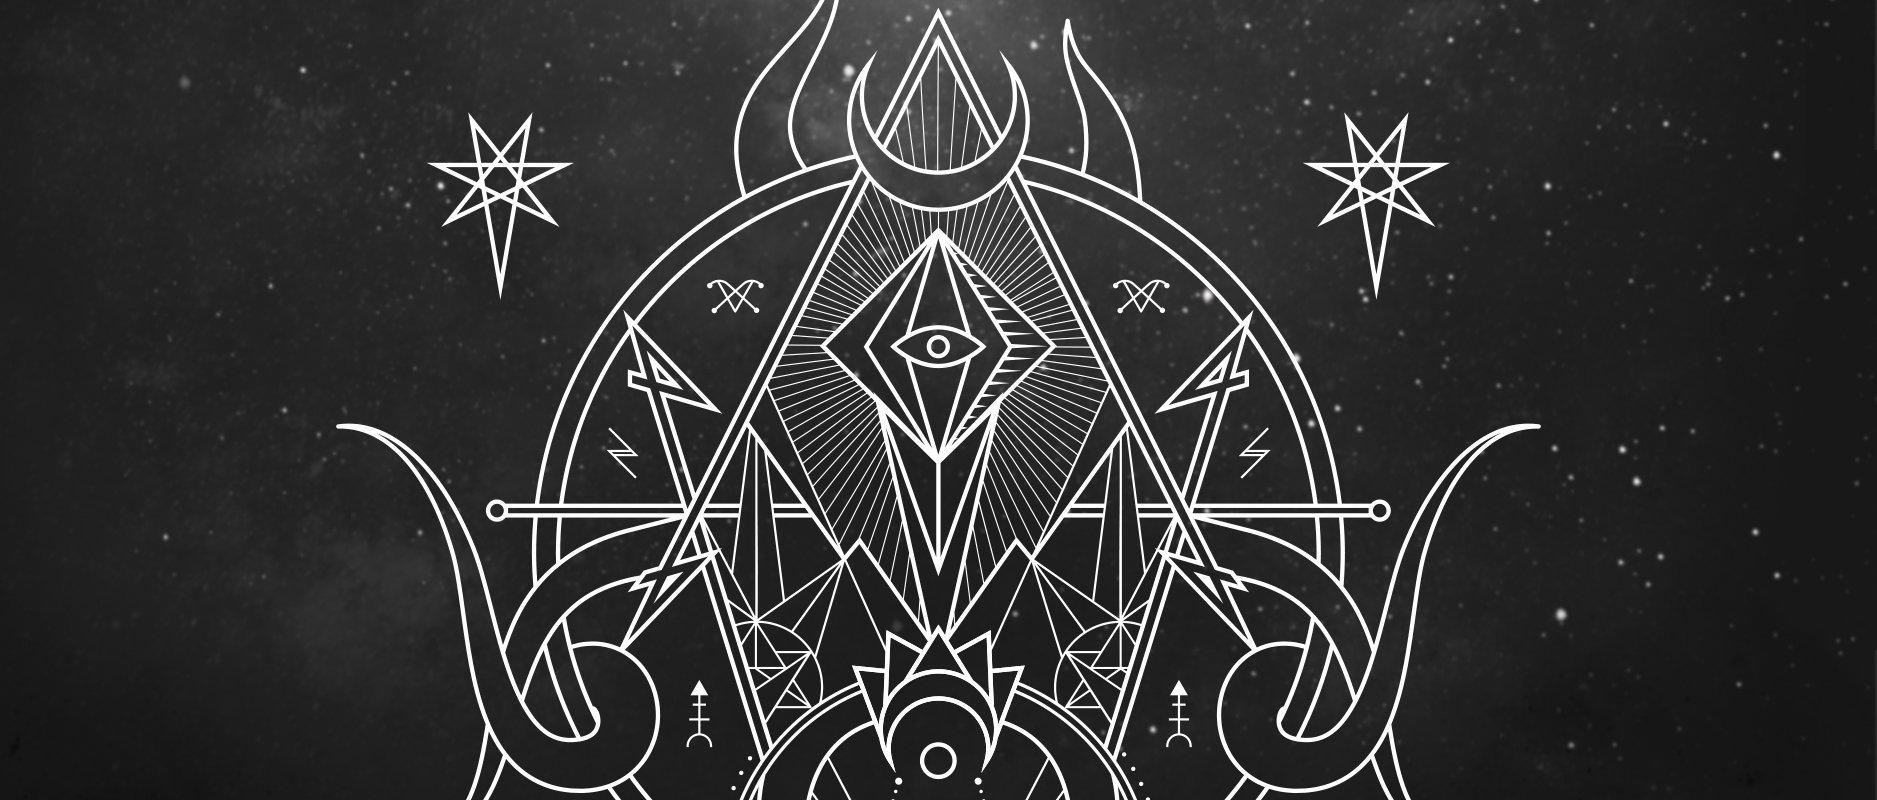 Atlas Negro, Alva Aur, Noviembre Nocturno